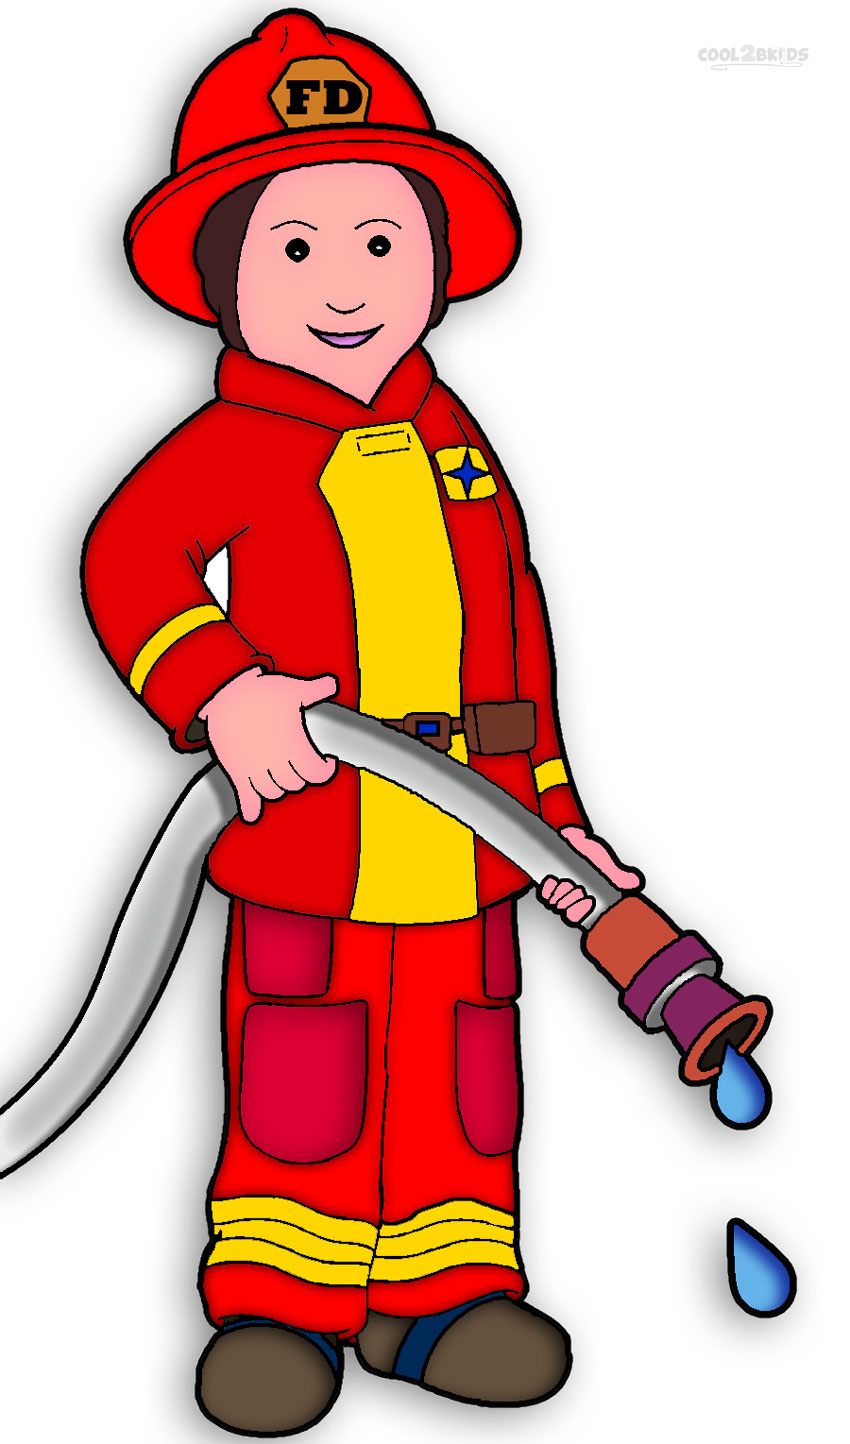 Fireman clipart. Firefighter panda free images